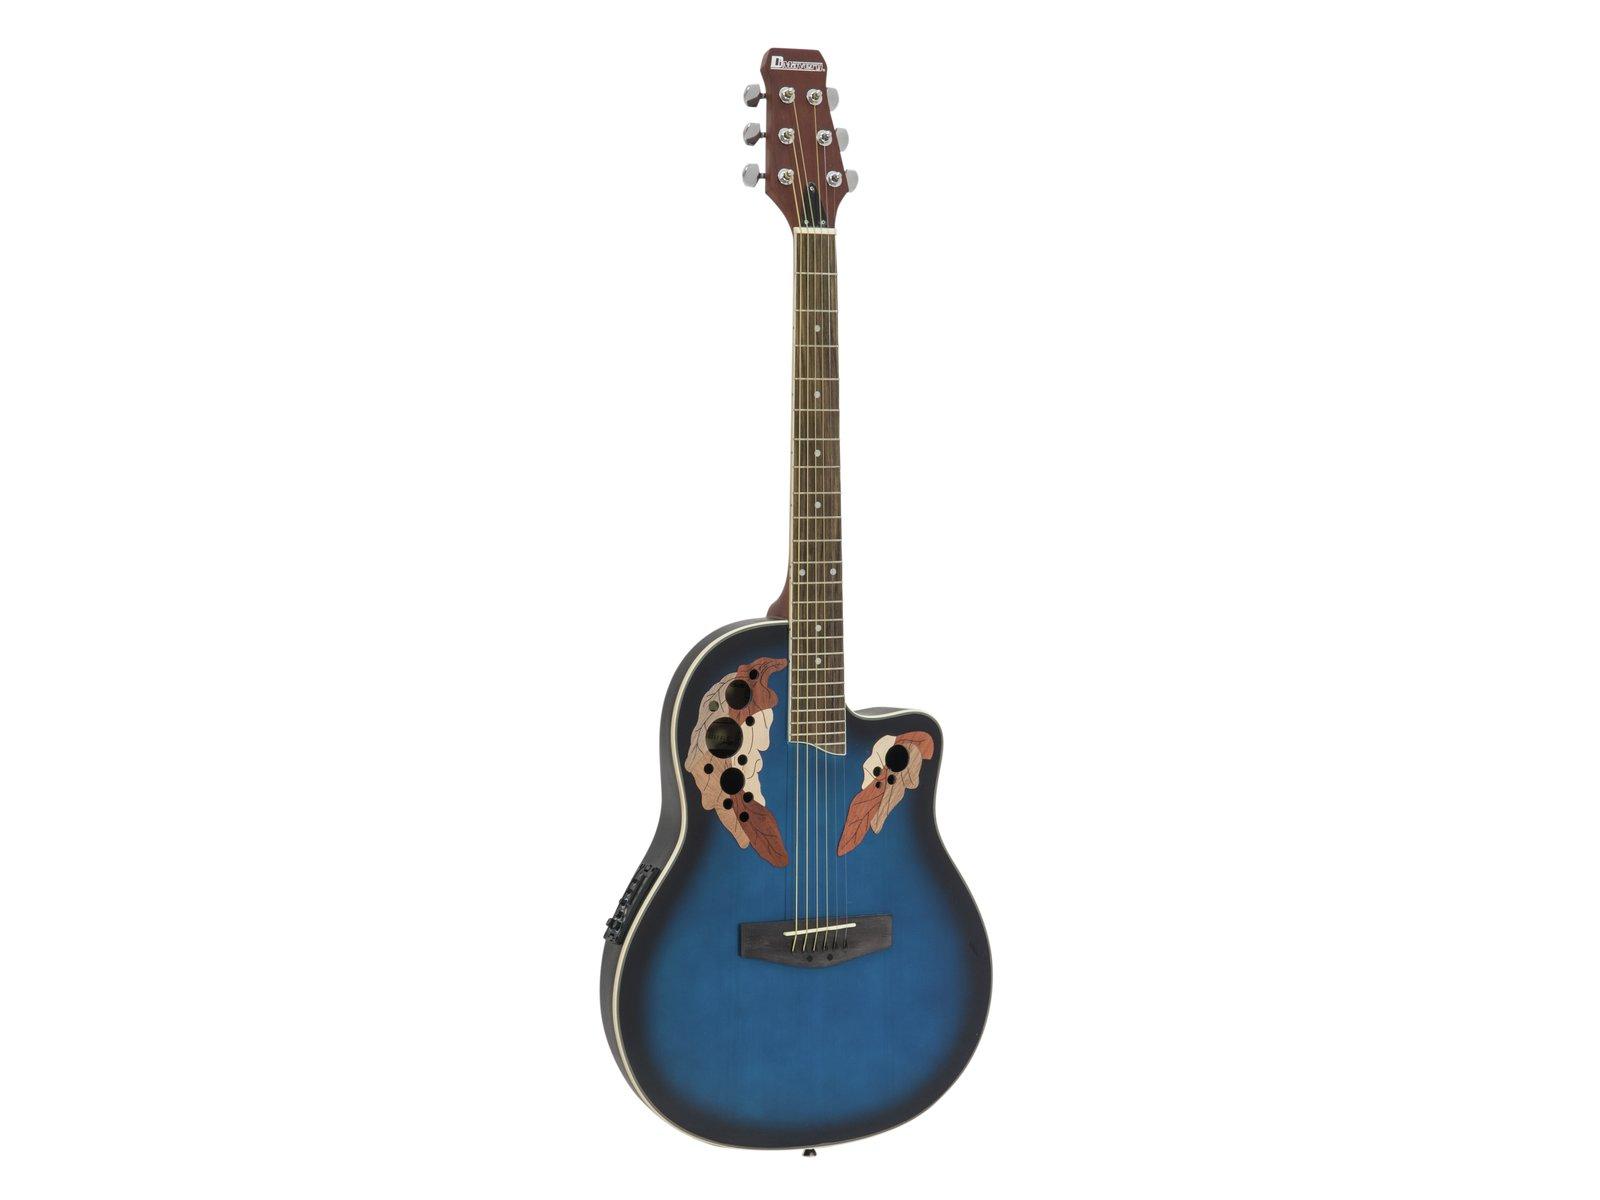 Fotografie Dimavery OV-500 elektro-akustická kytara Ovation, žíhaná modrá